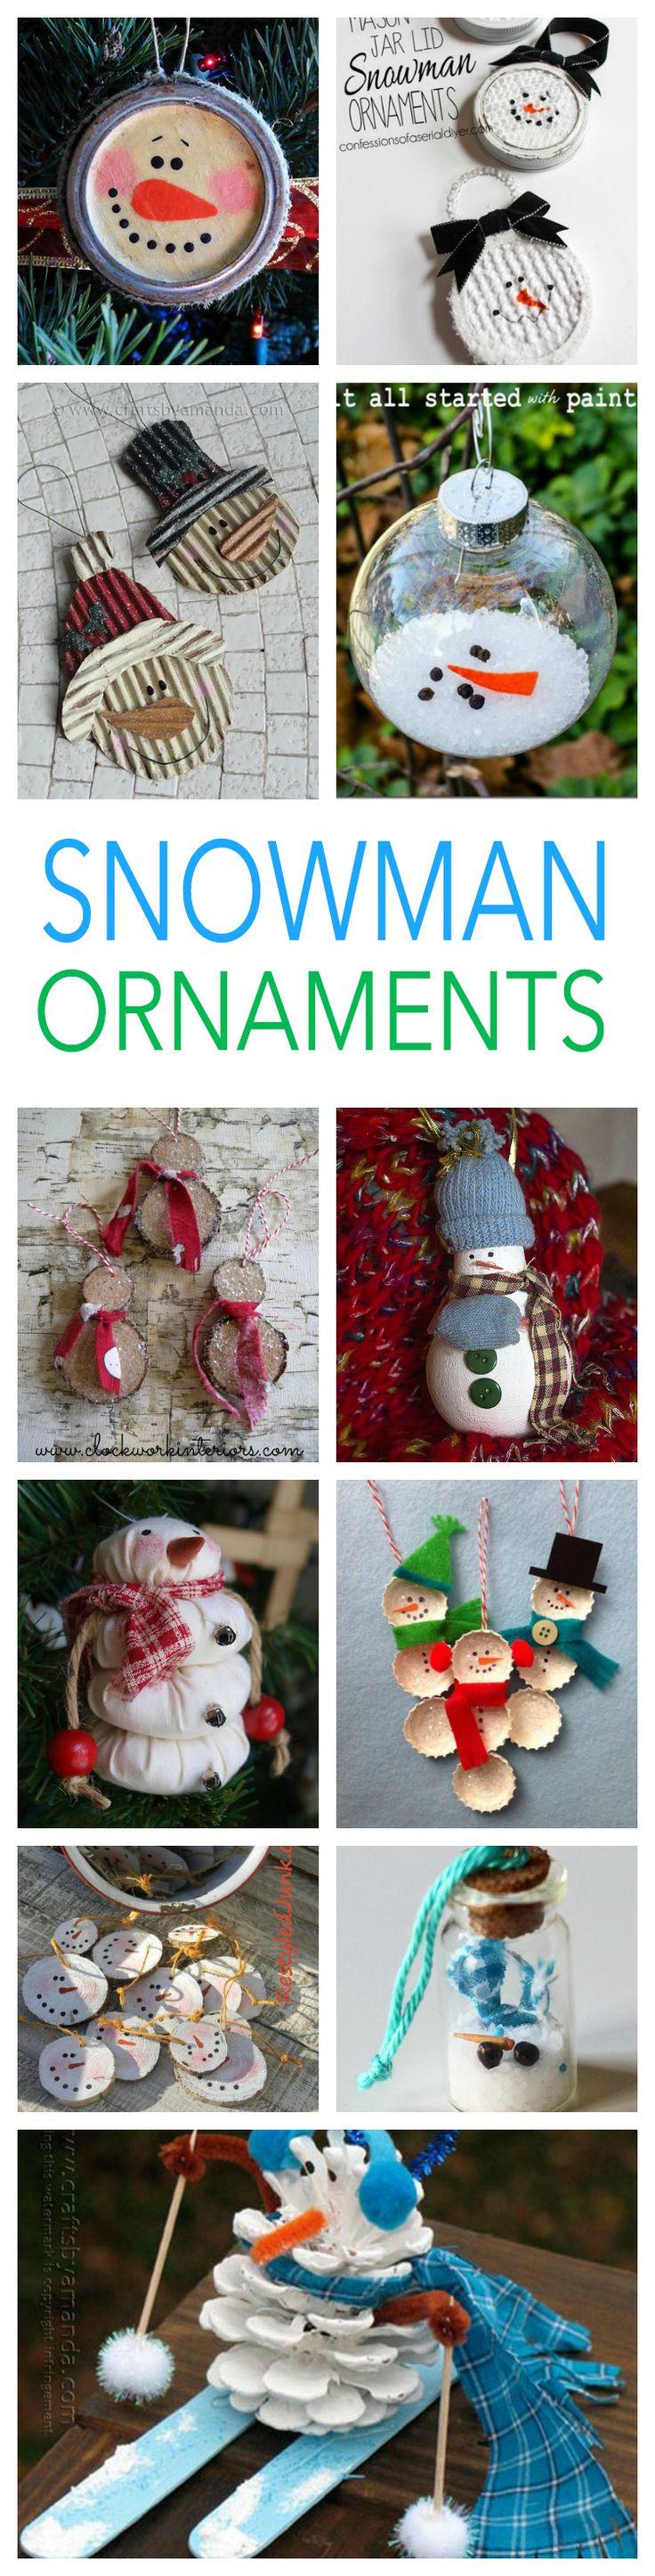 27 Diy Snowman Ornaments For Christmas: Snowman Ornament Crafts